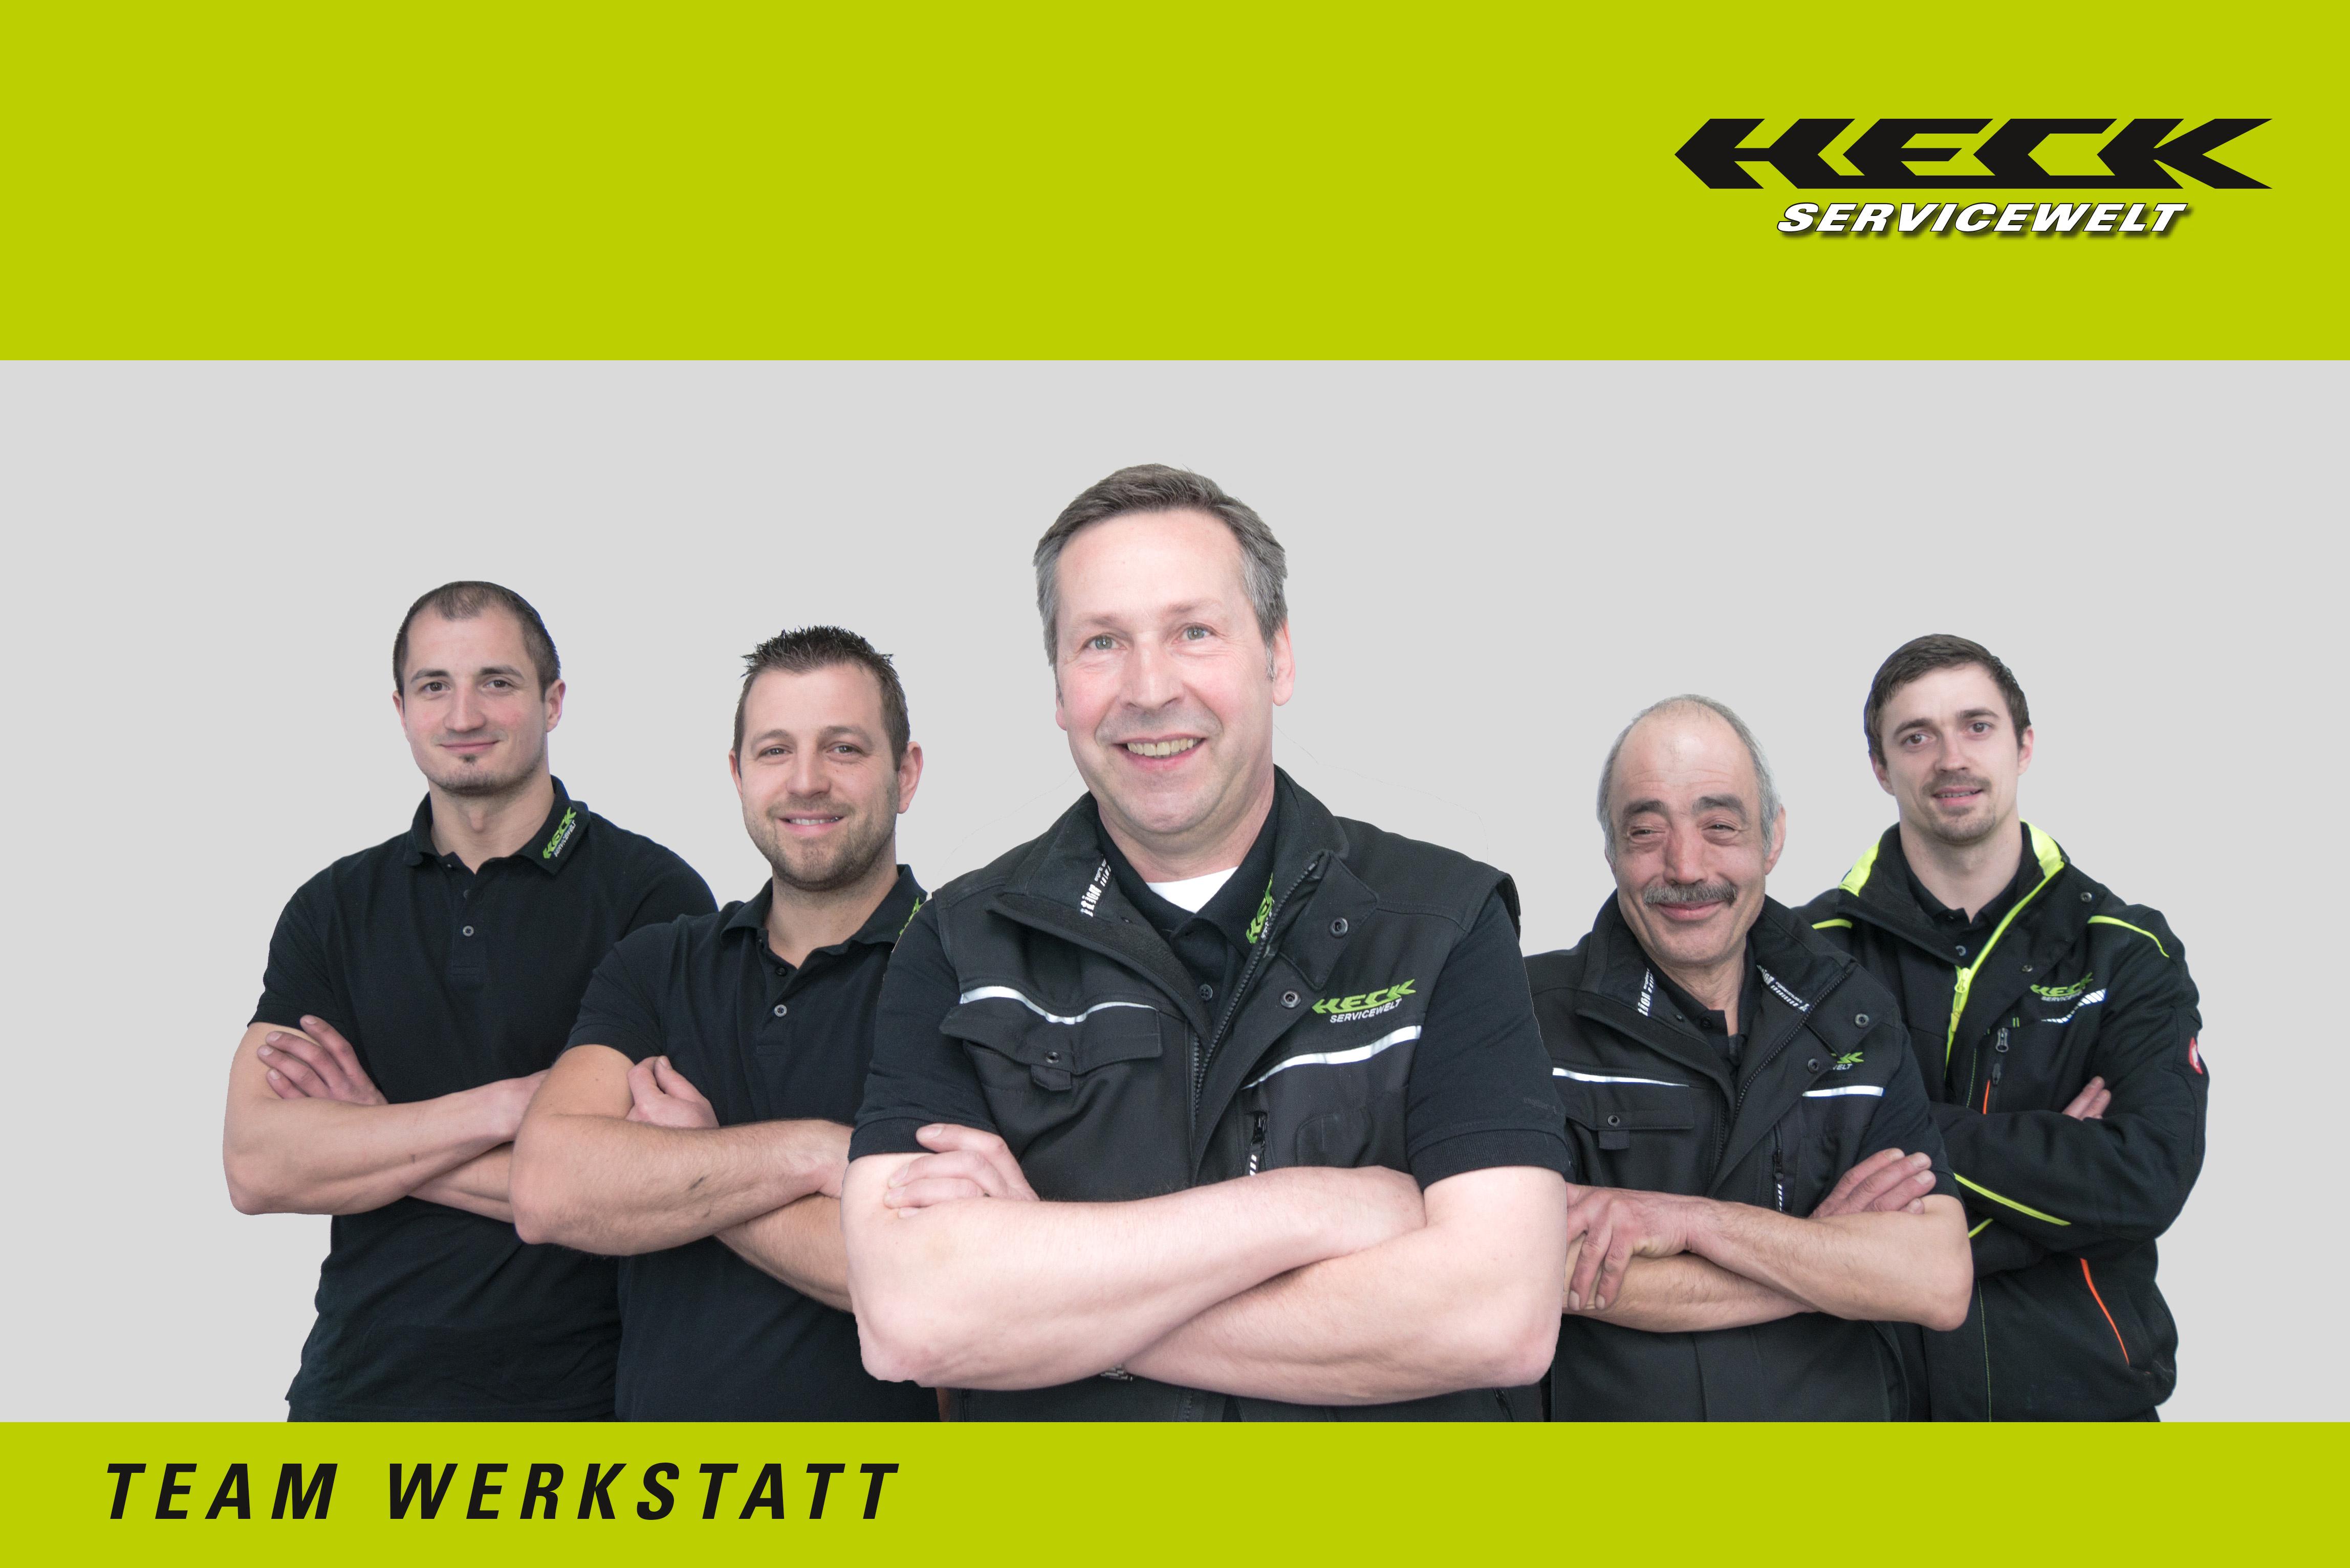 Team Tankstelle Heck